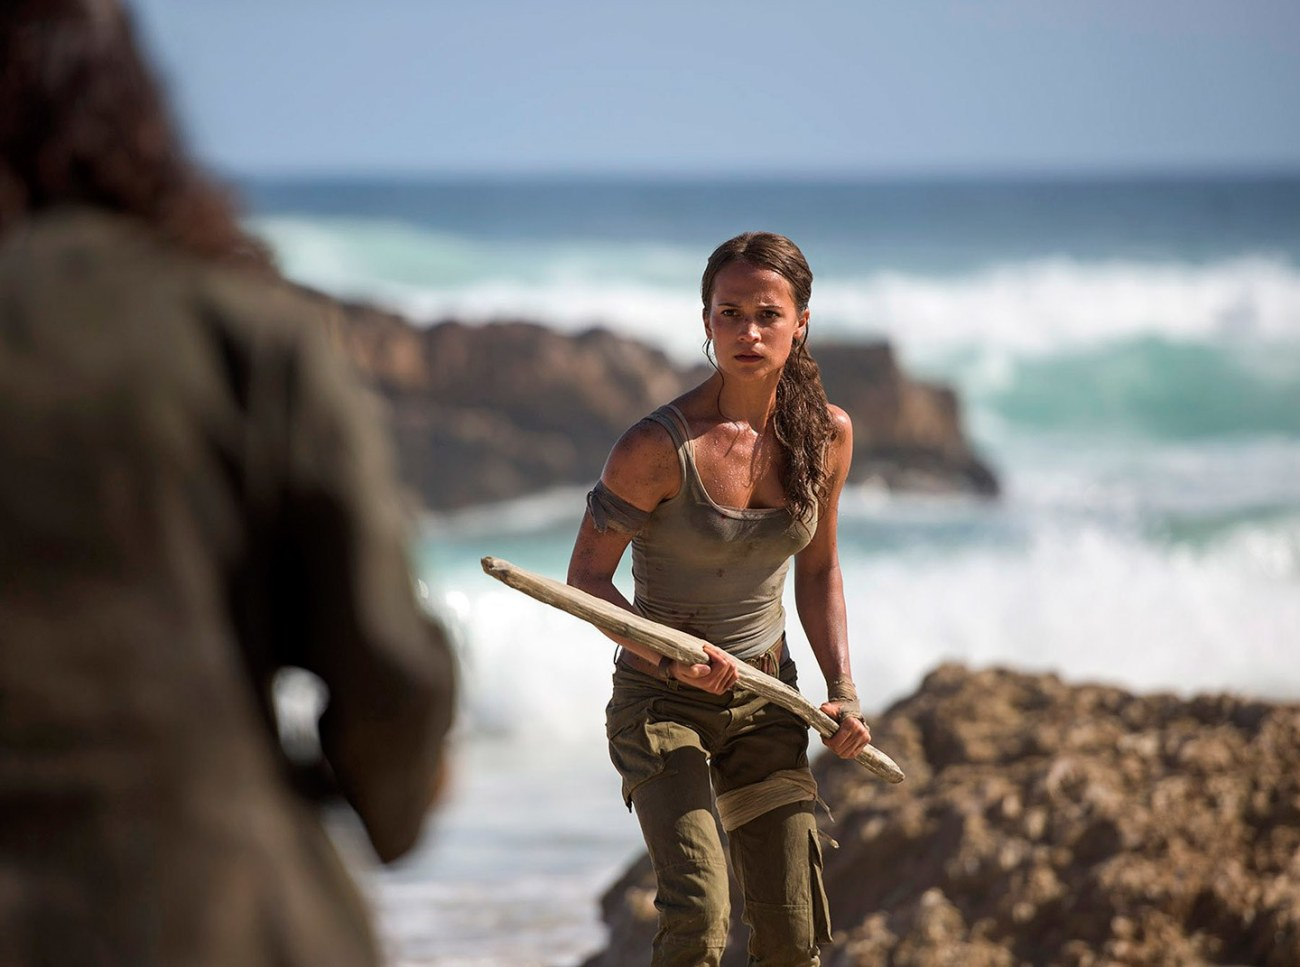 Alicia Vikander como Lara Croft en Tomb Raider (2018). Imagen: Graham Bortholomew.